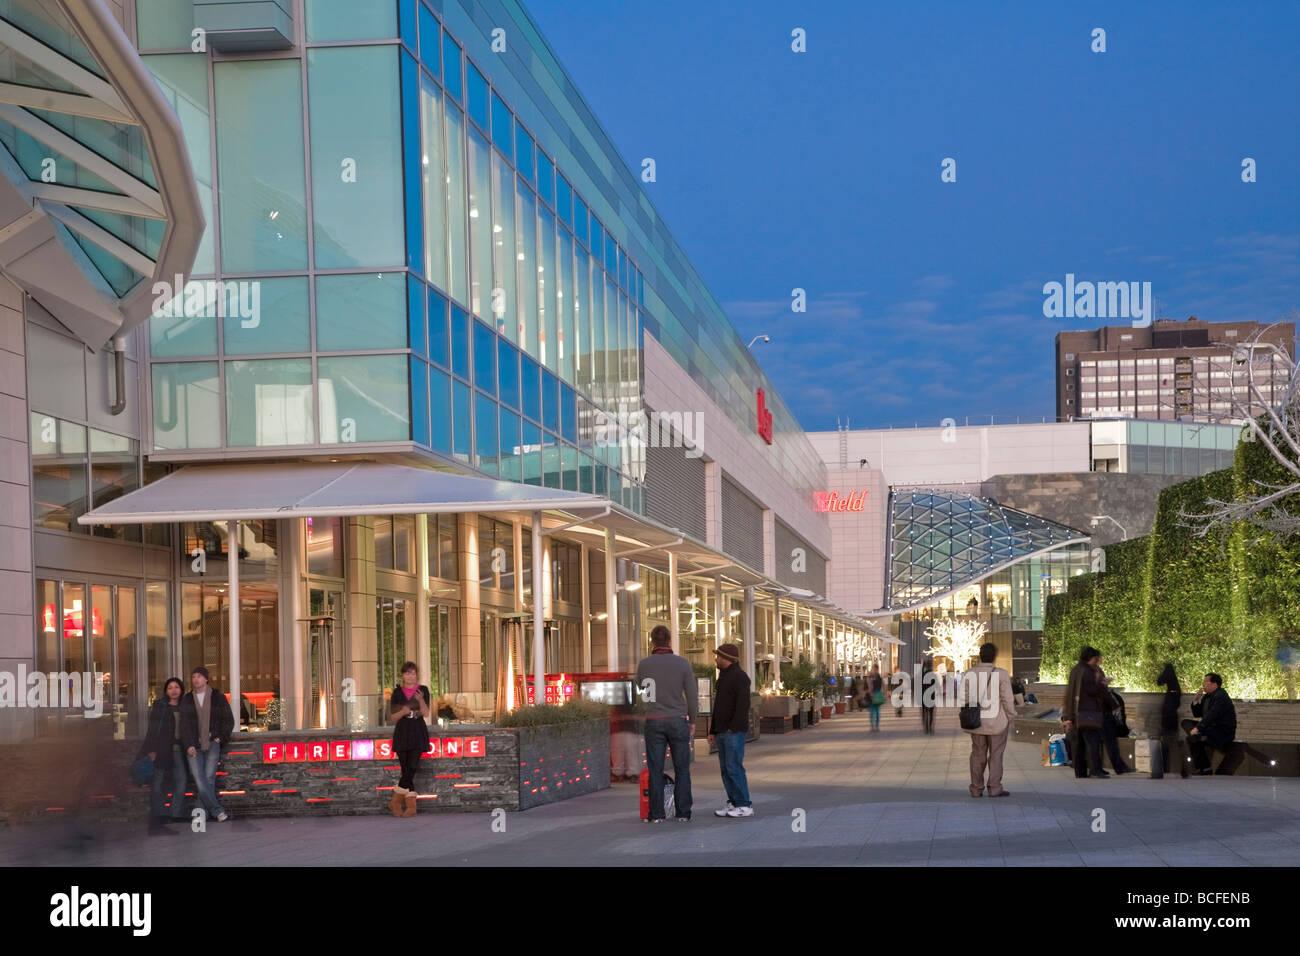 England, London, Shepherds Bush, Westfield shopping centre - Stock Image